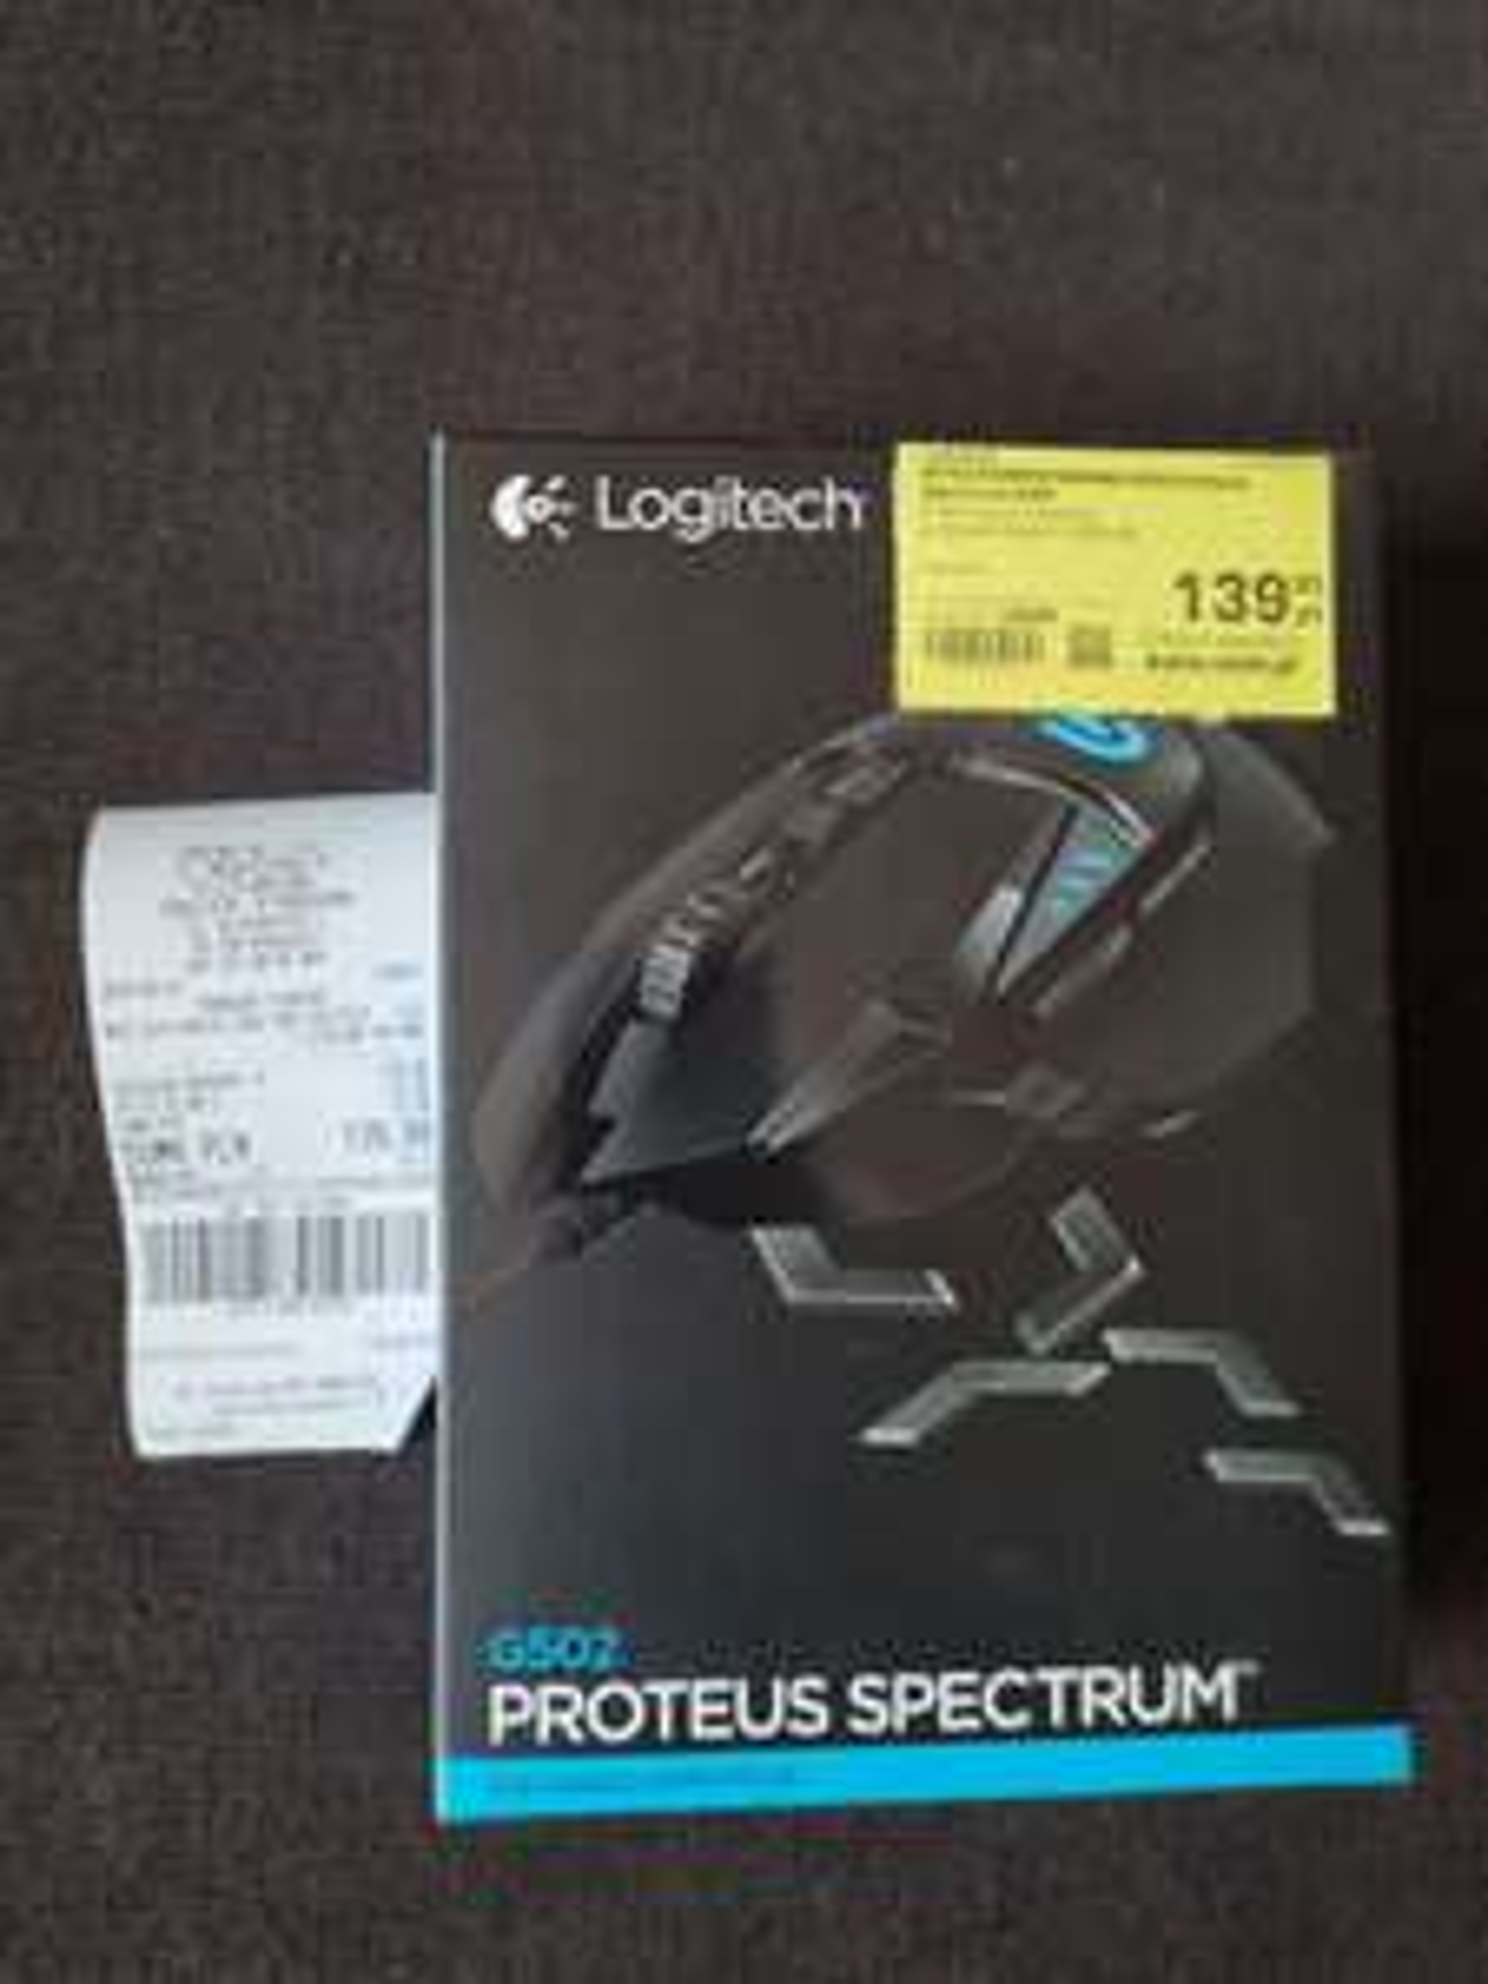 Mysz Logitech G502 Proteus Spectrum RGB - RTV EURO AGD